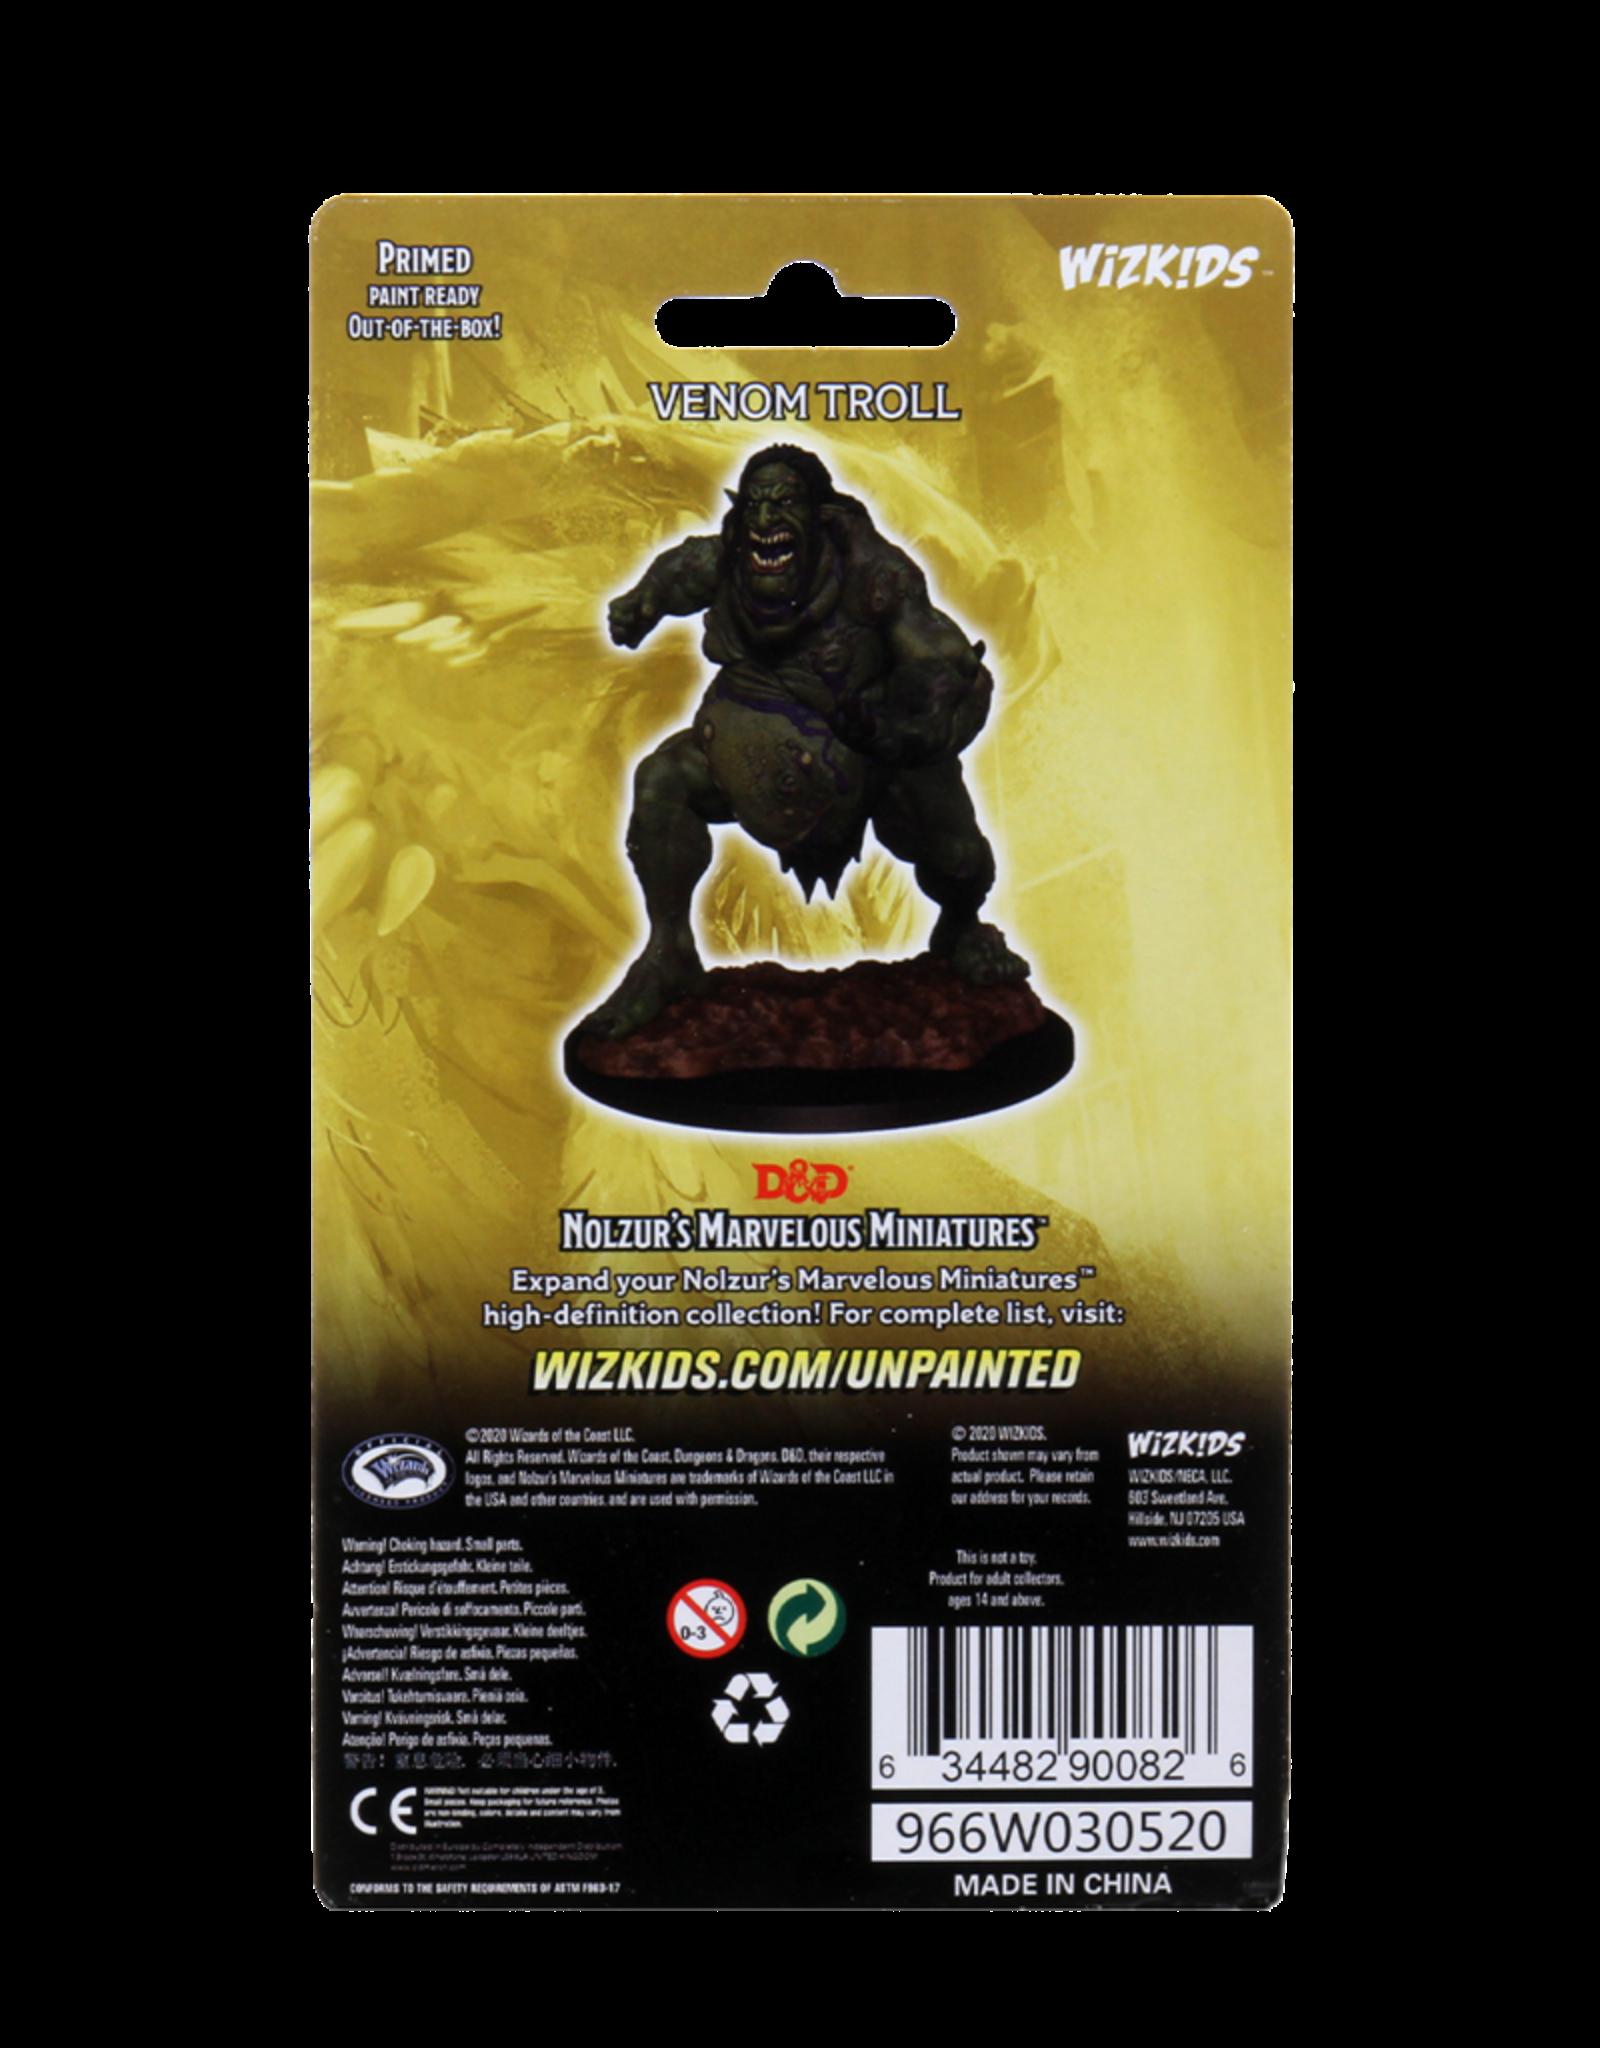 Wizkids D&D Unpainted Minis: Venom Troll